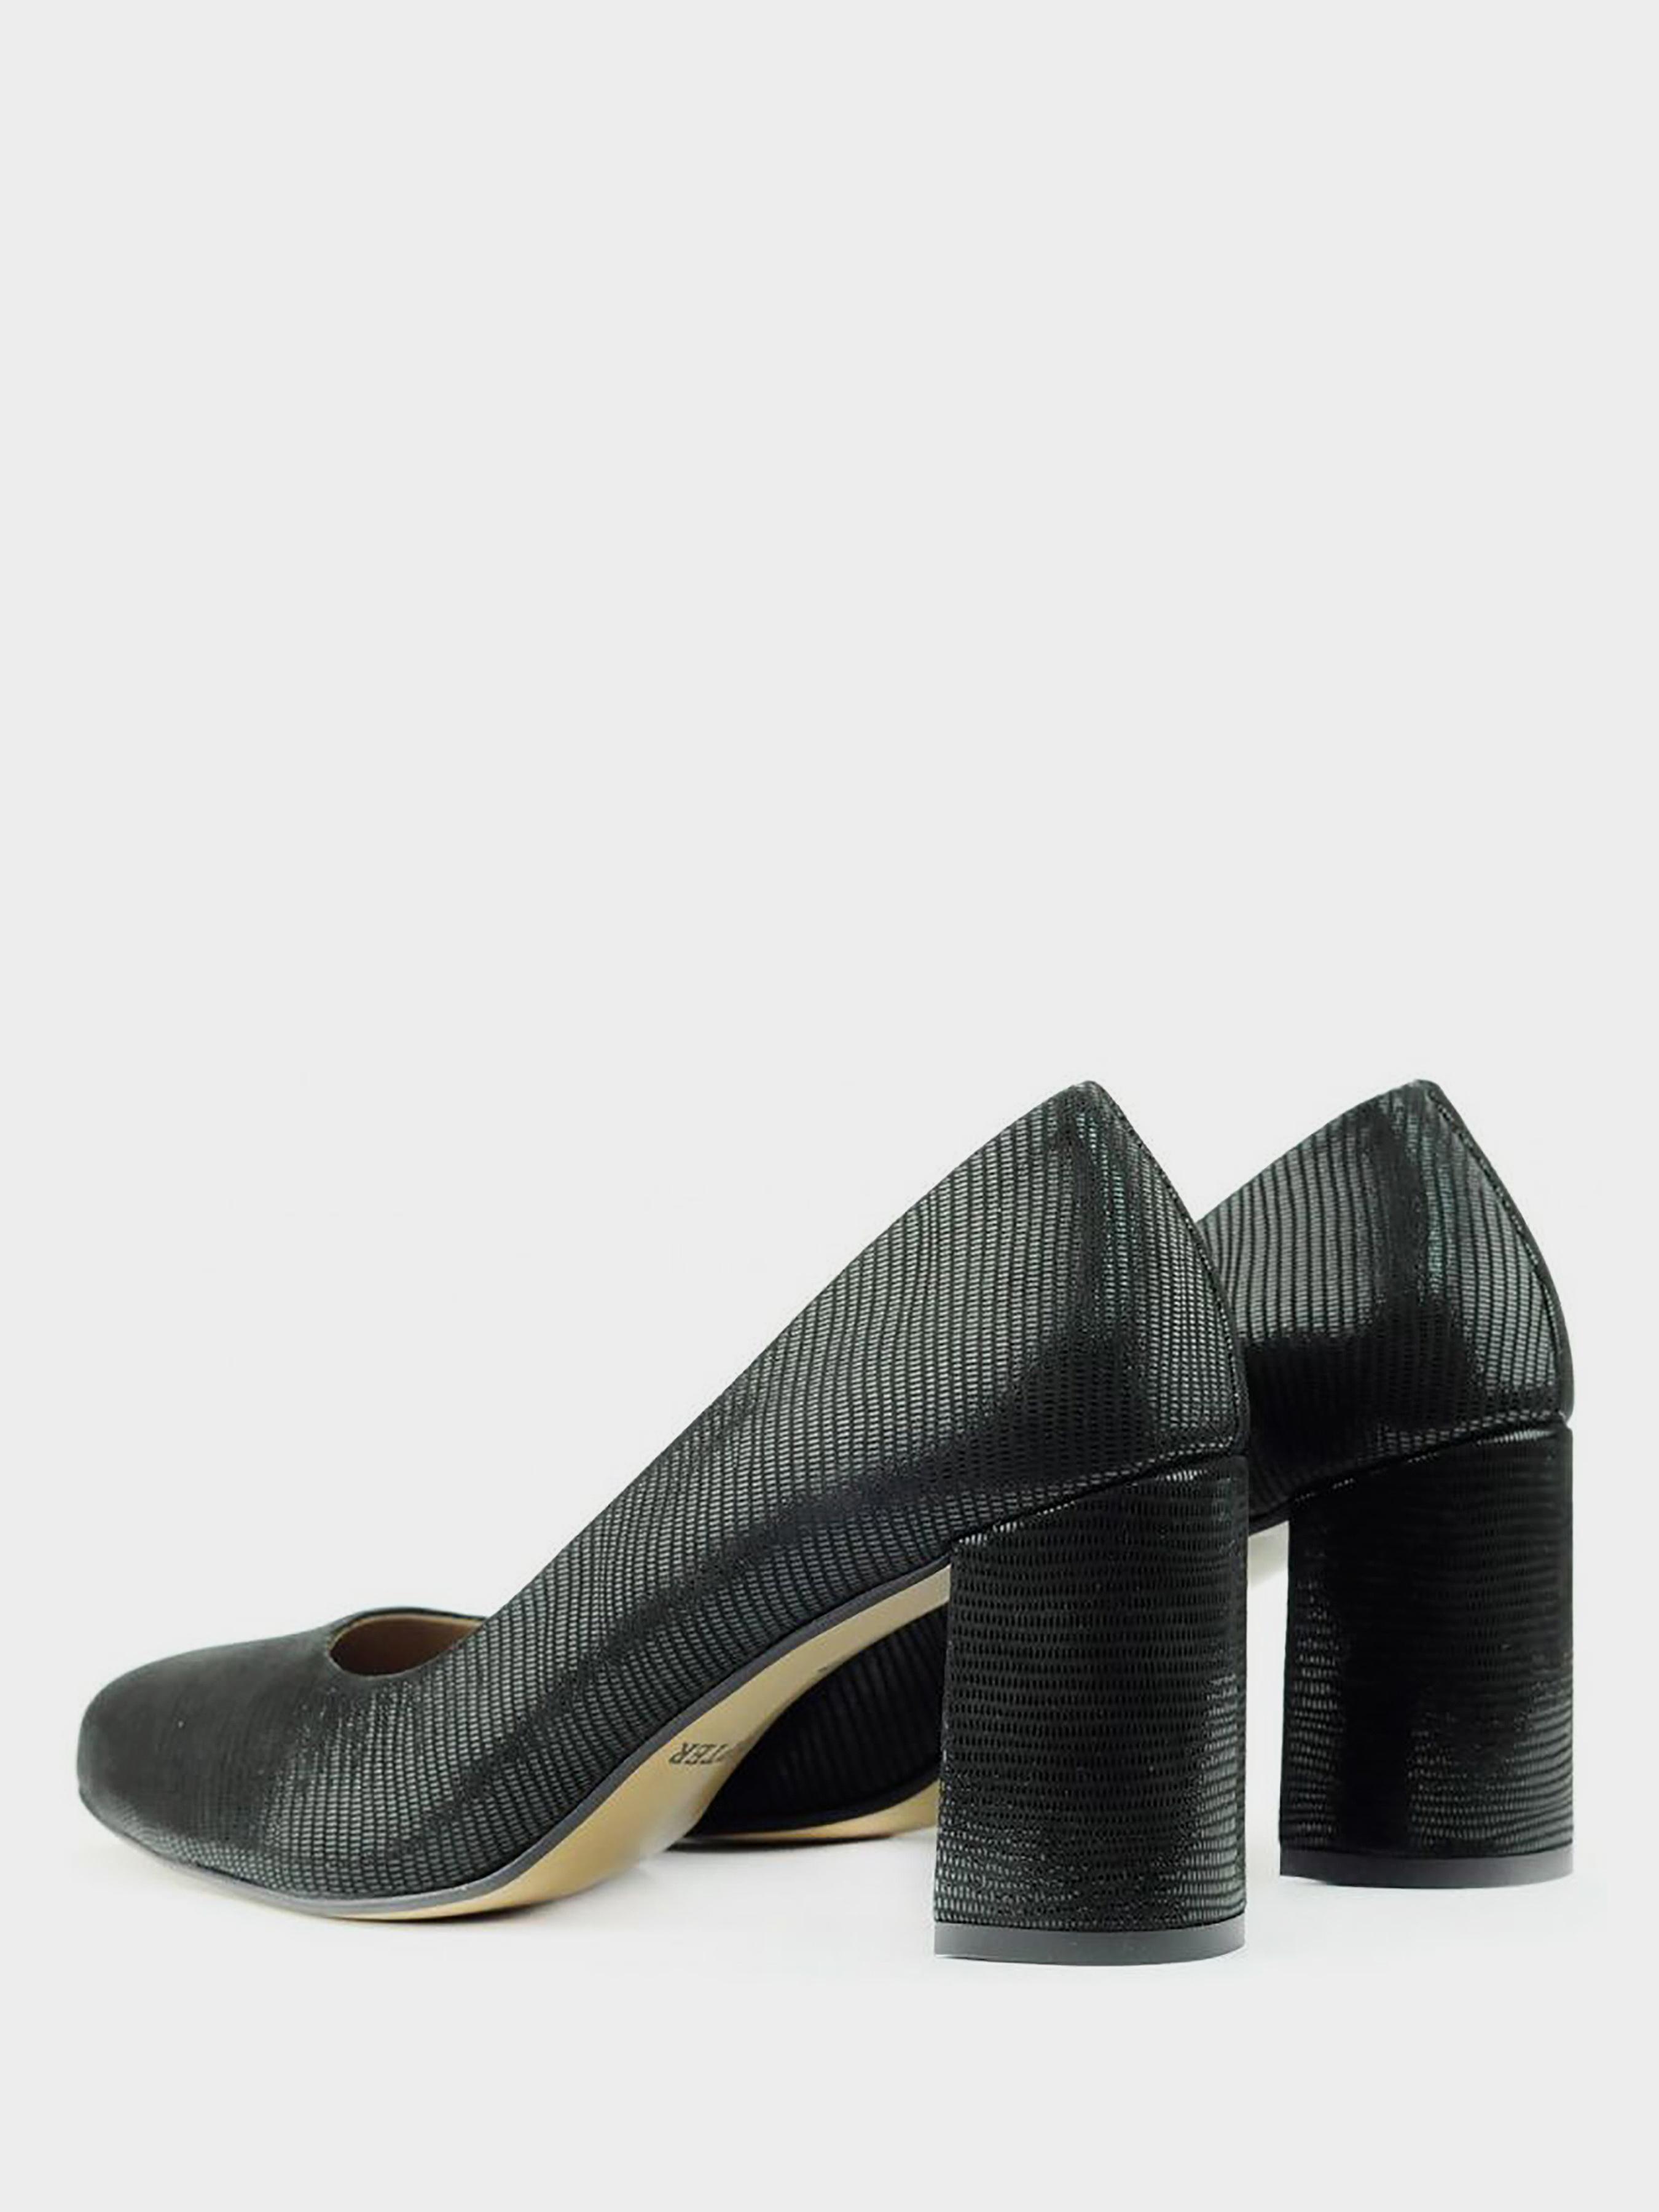 Туфли для женщин Стептер 9K45 цена, 2017